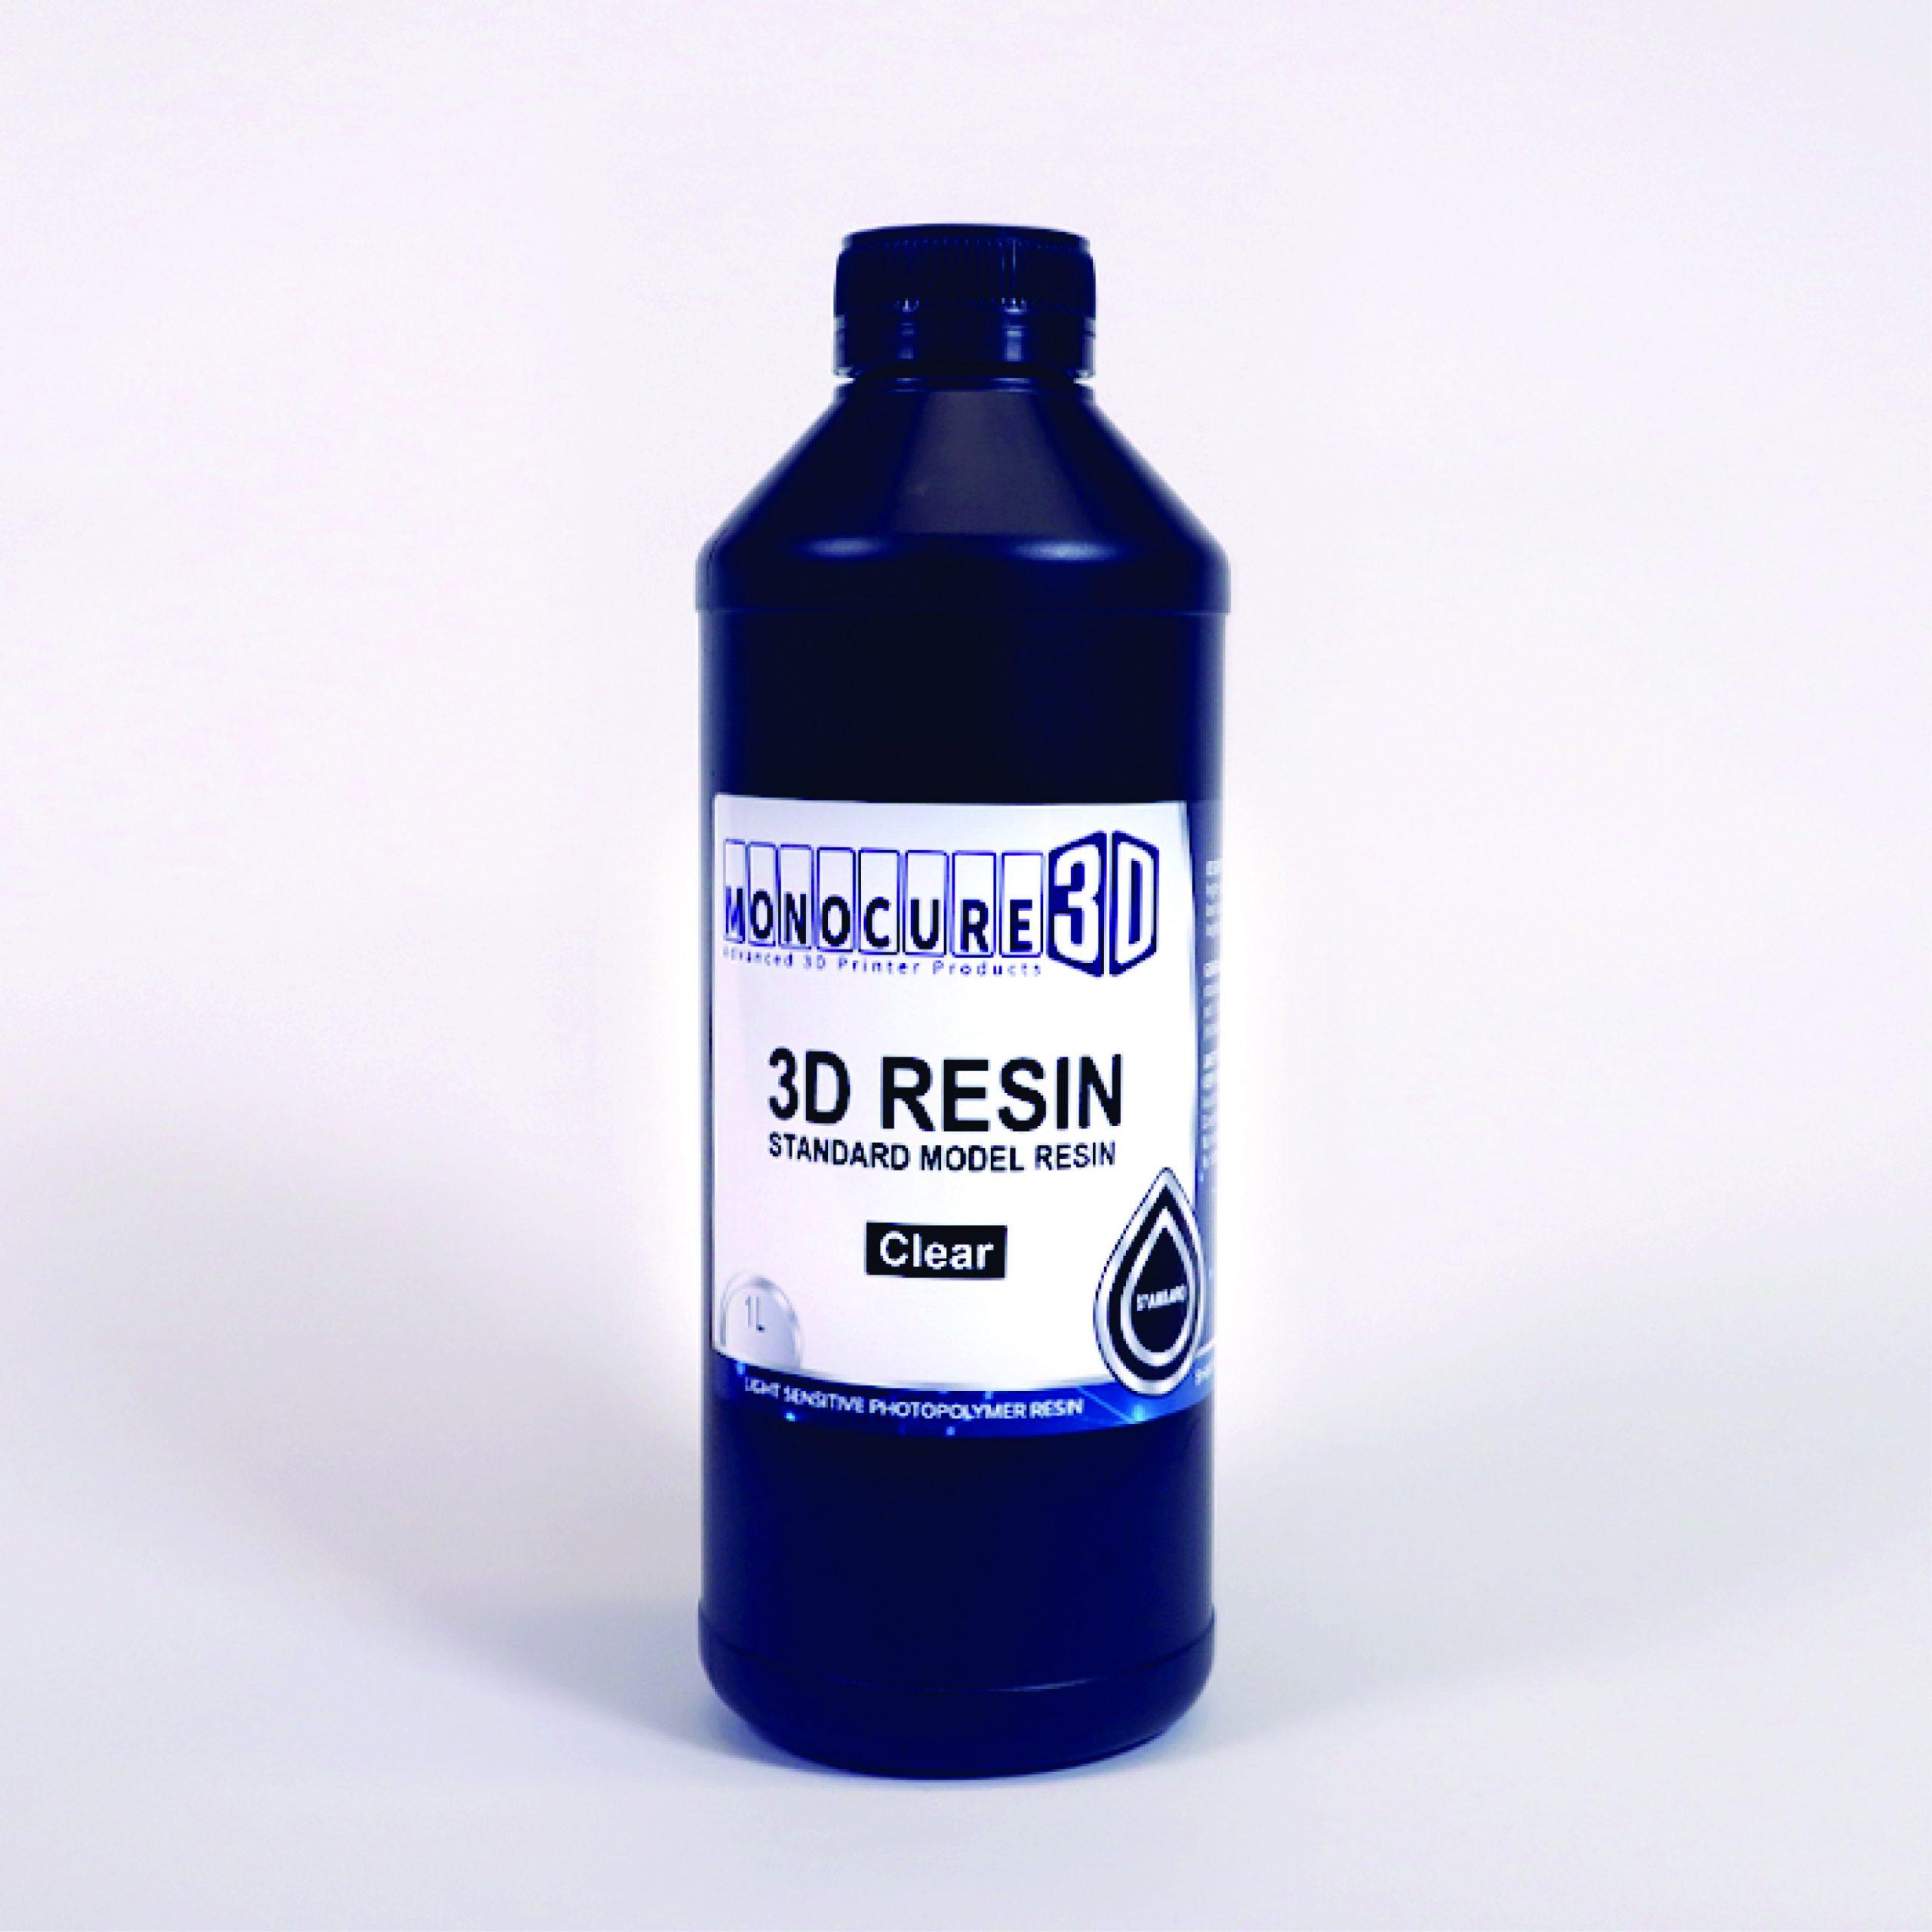 MonoCure 3D Standard Resin